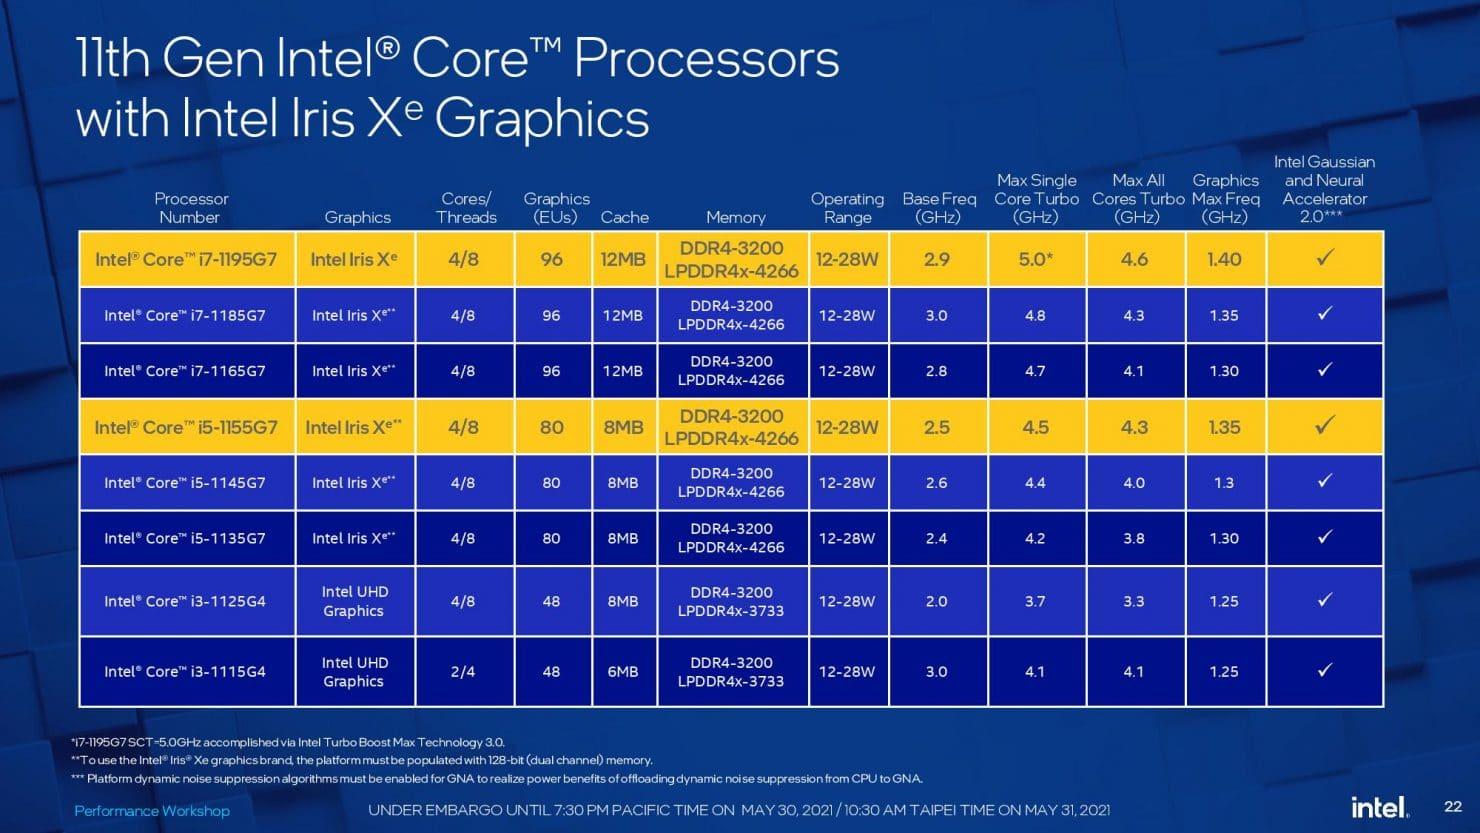 Intel Core computex